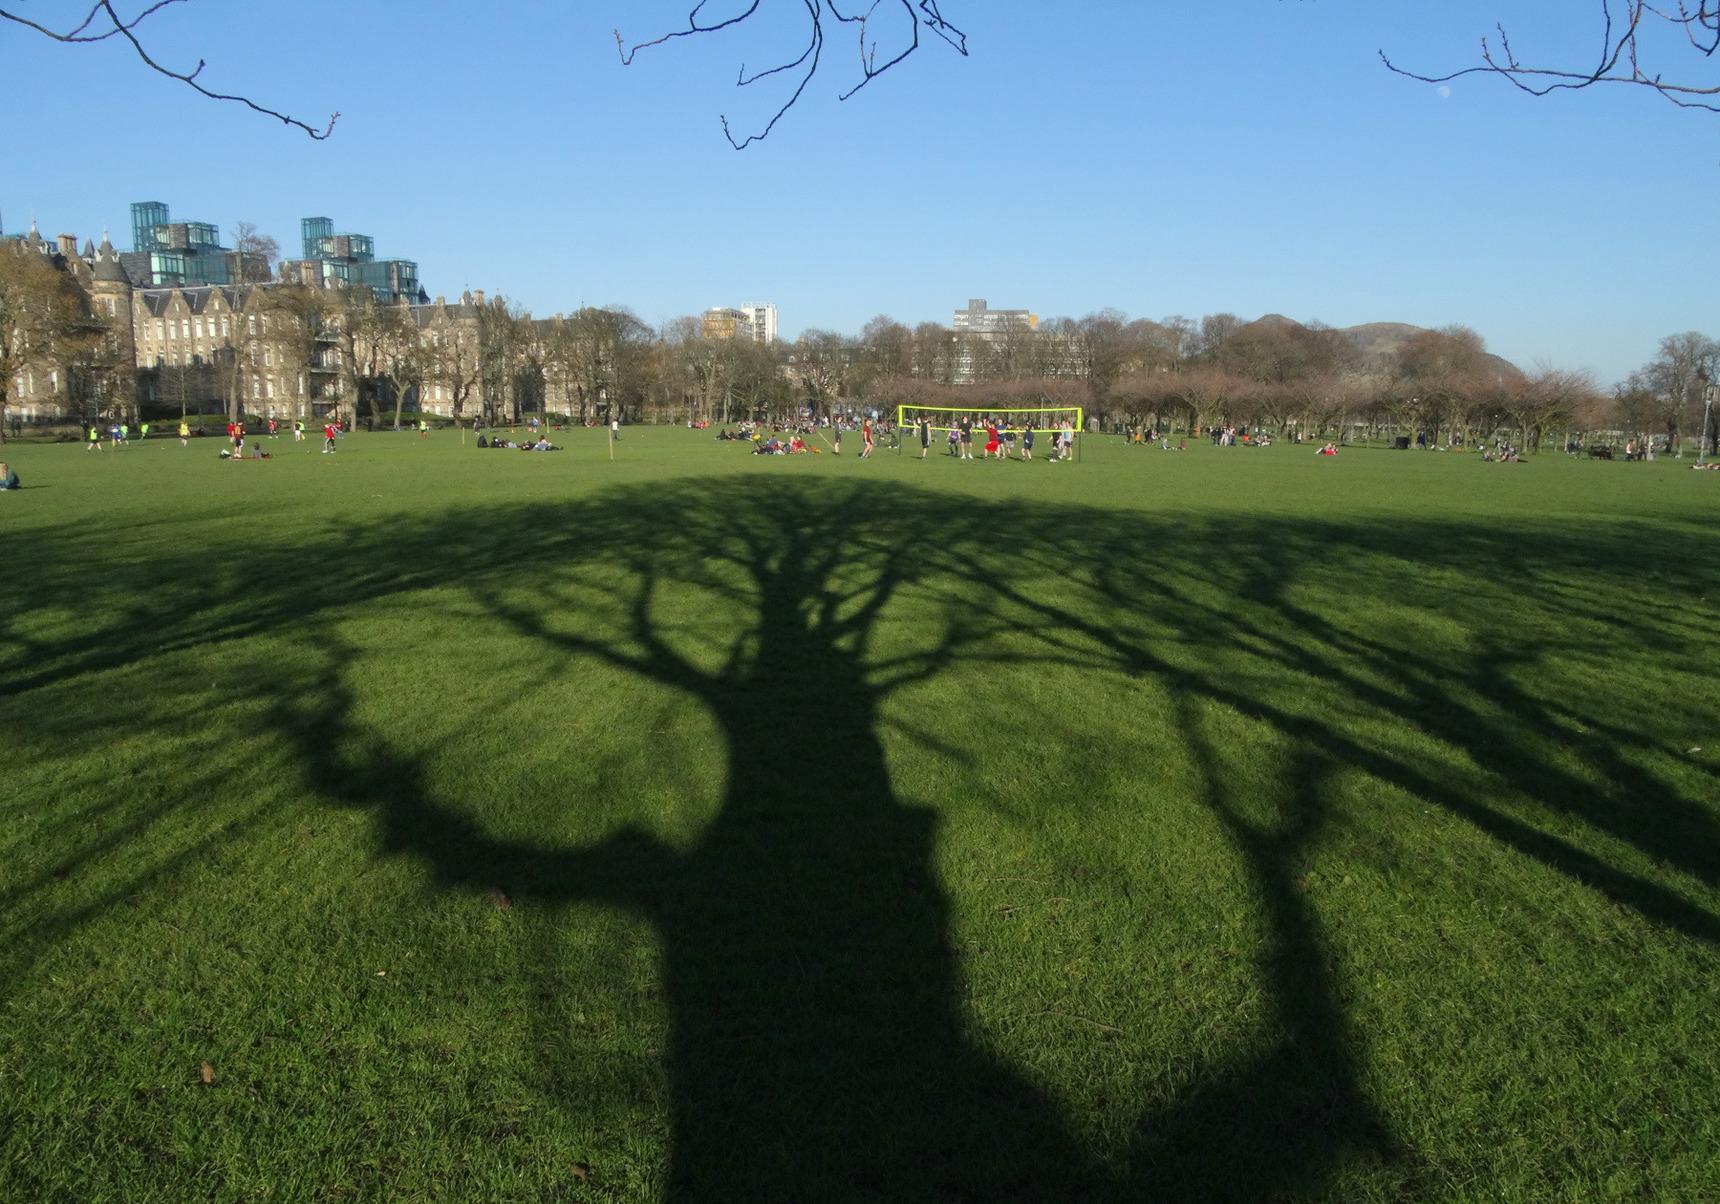 Tree shadows on Meadows